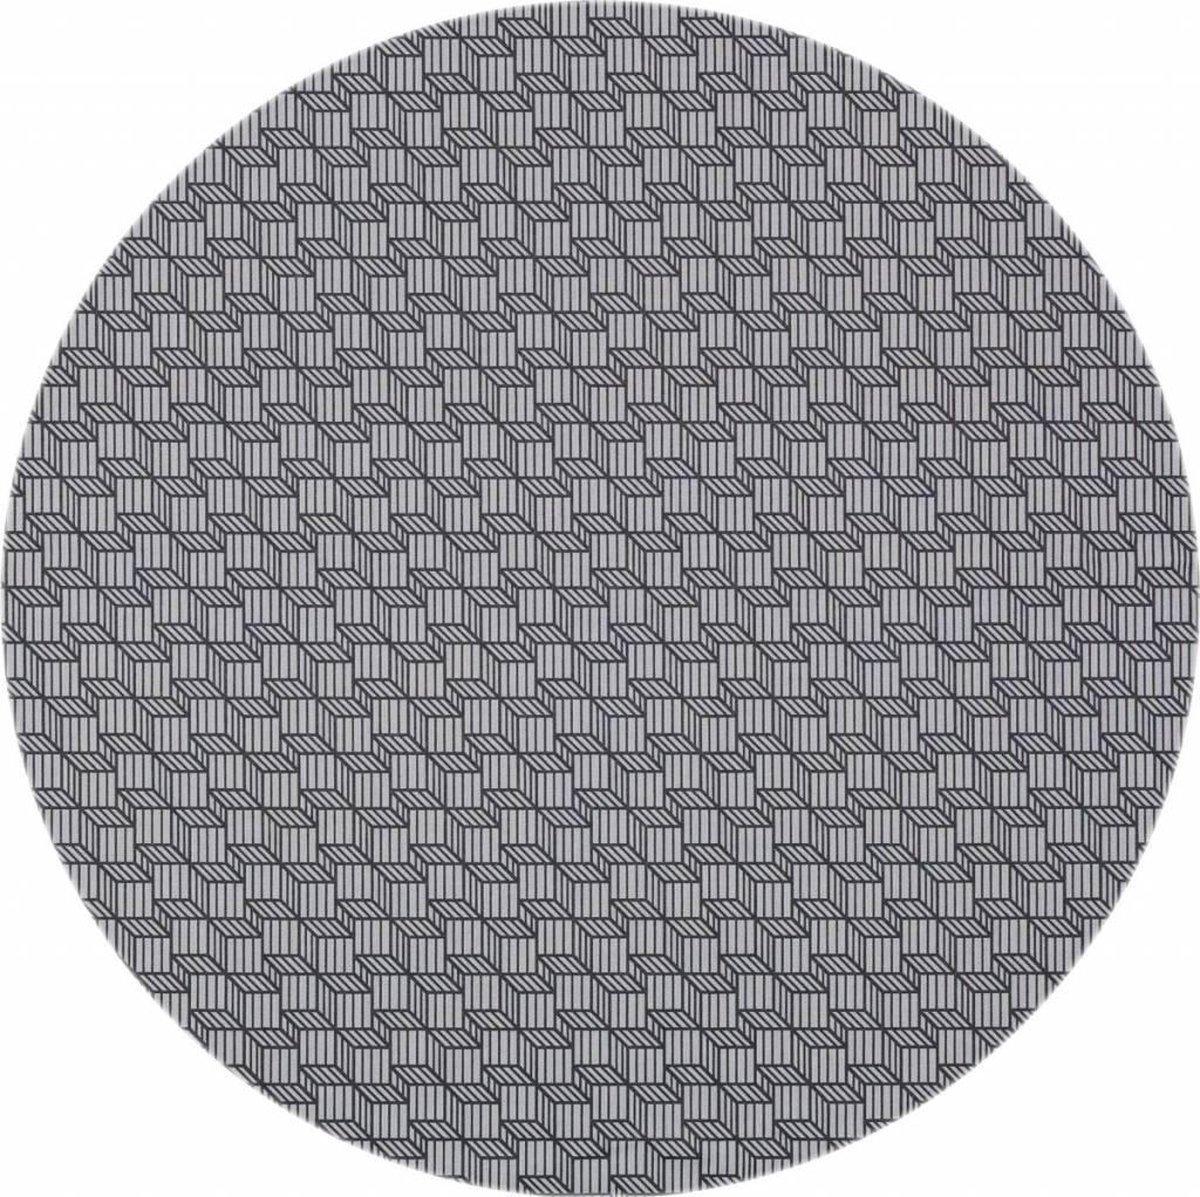 MixMamas Rond Tafelkleed Gecoat - Ø 160 cm - Kubussen - Grijs - MixMamas